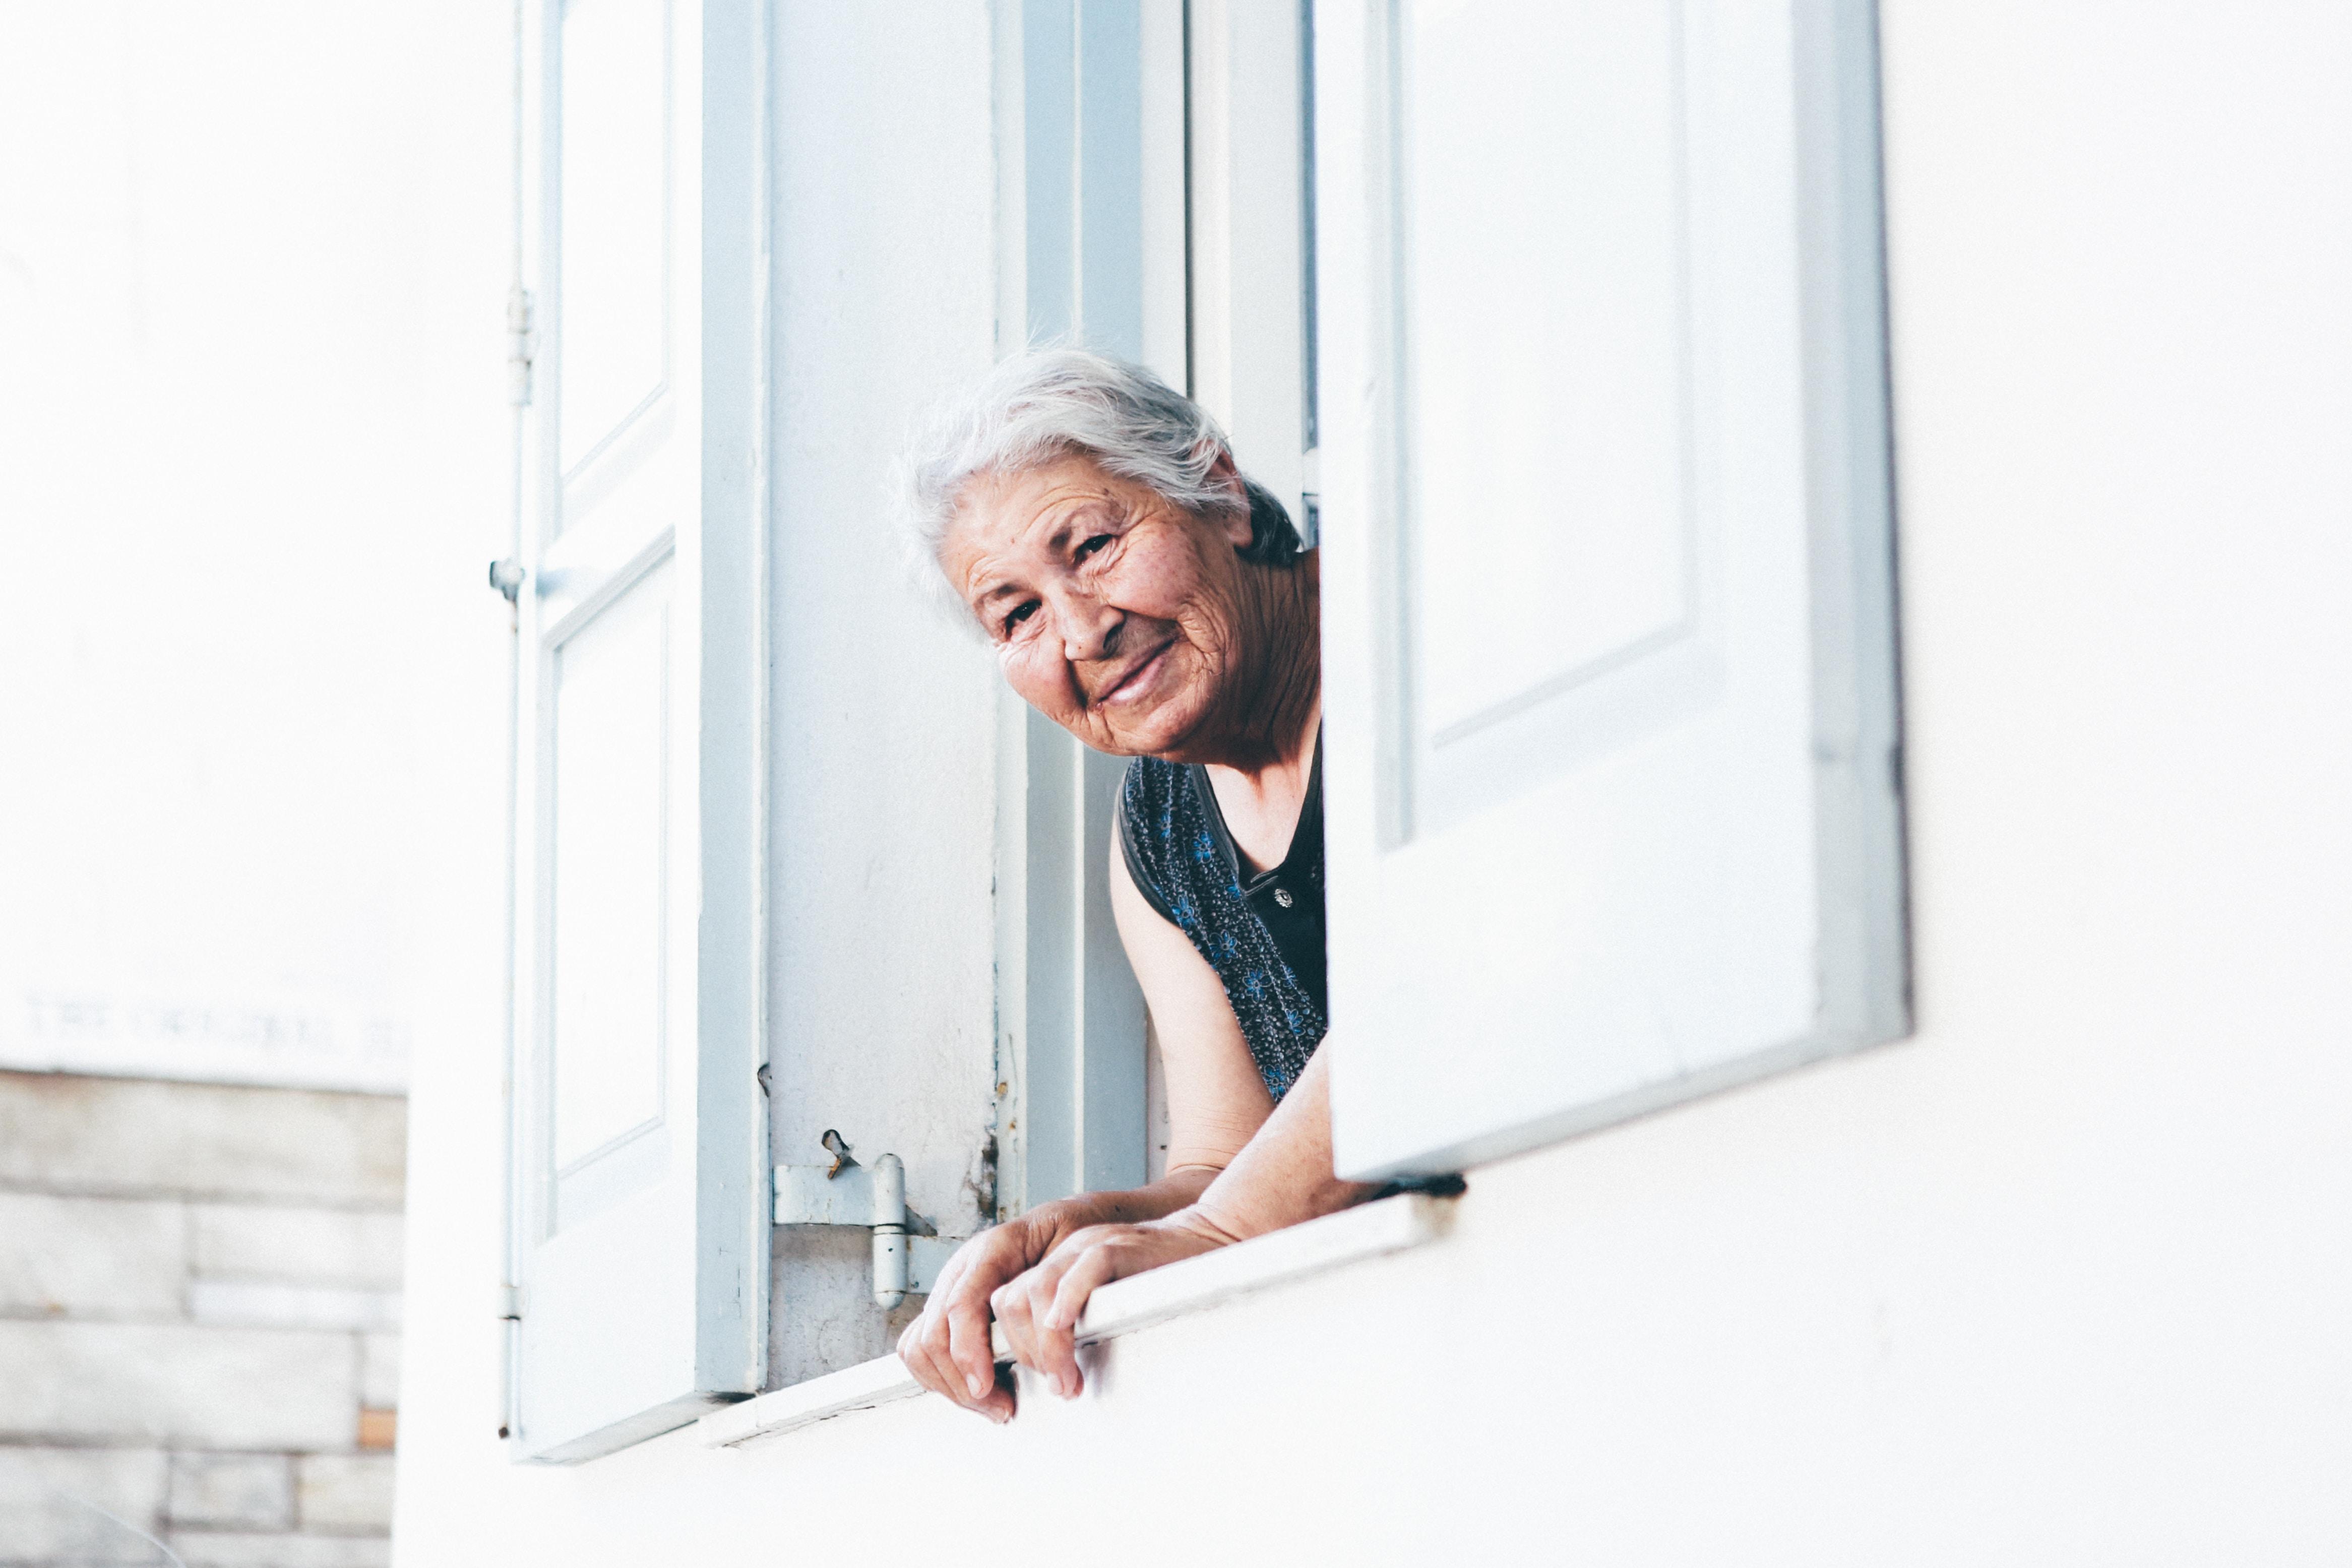 woman peeping at window